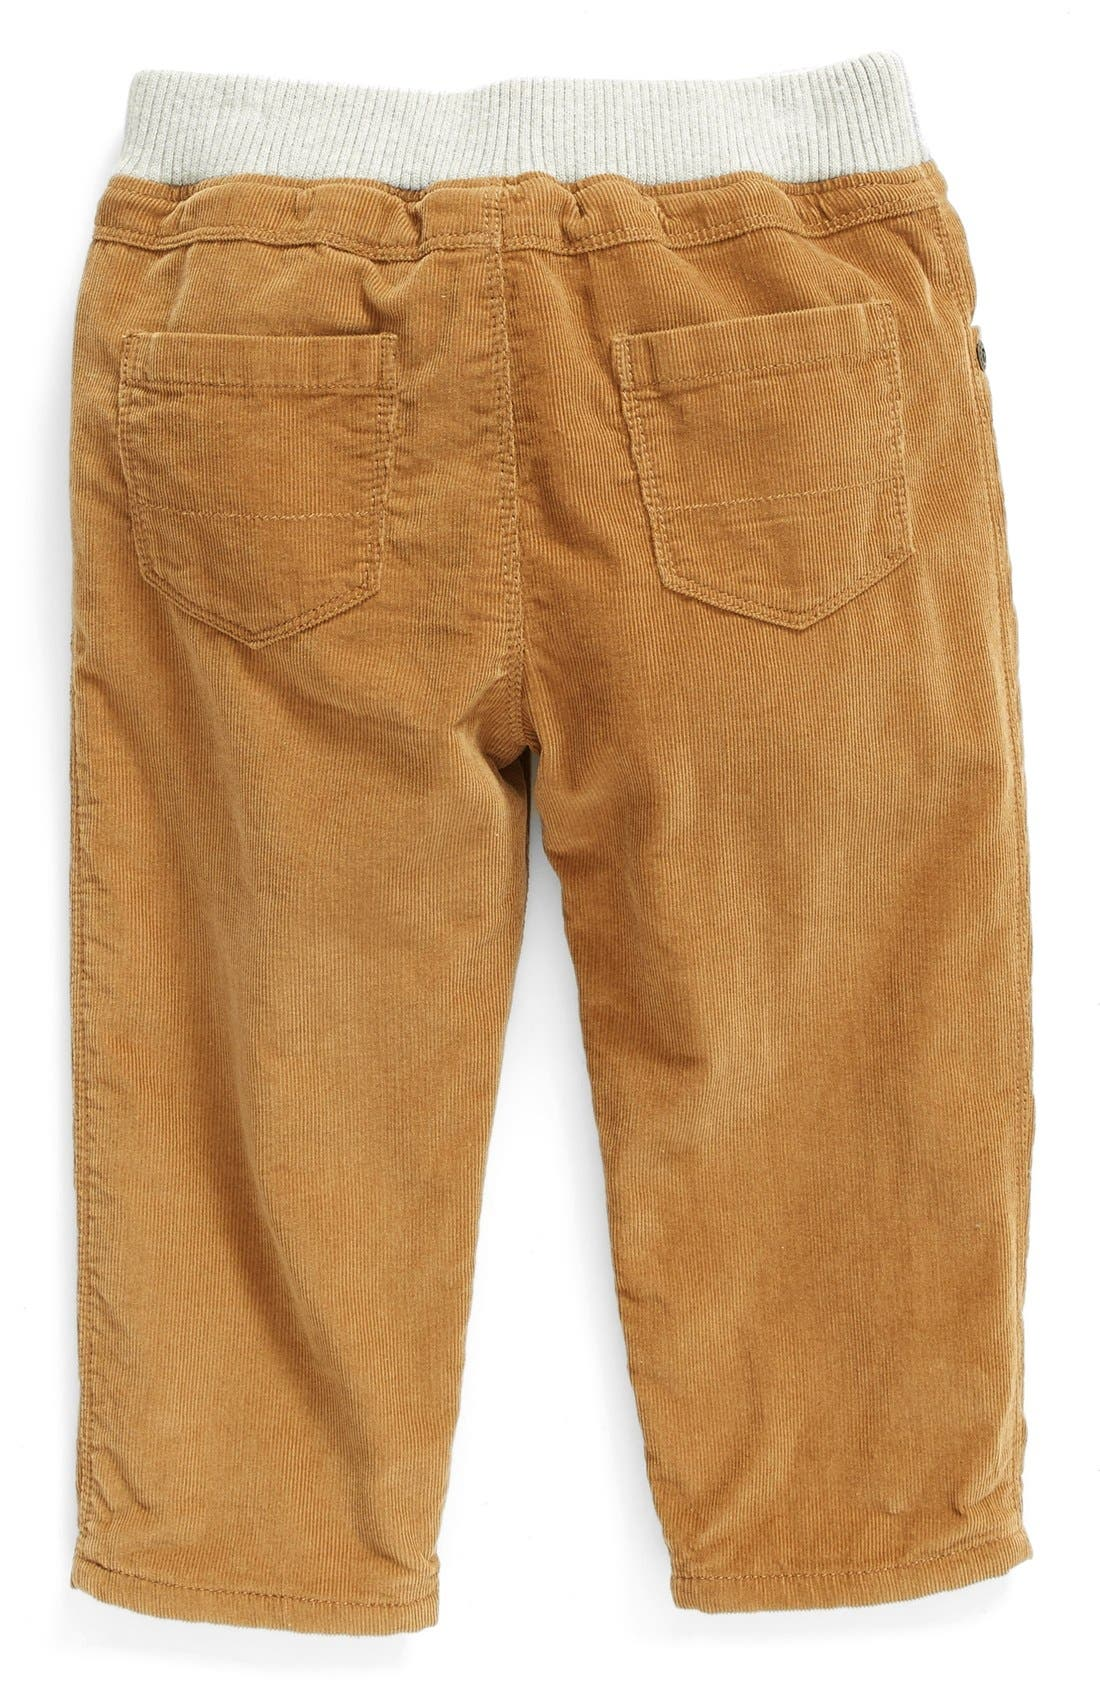 Corduroy Pants,                             Alternate thumbnail 2, color,                             210